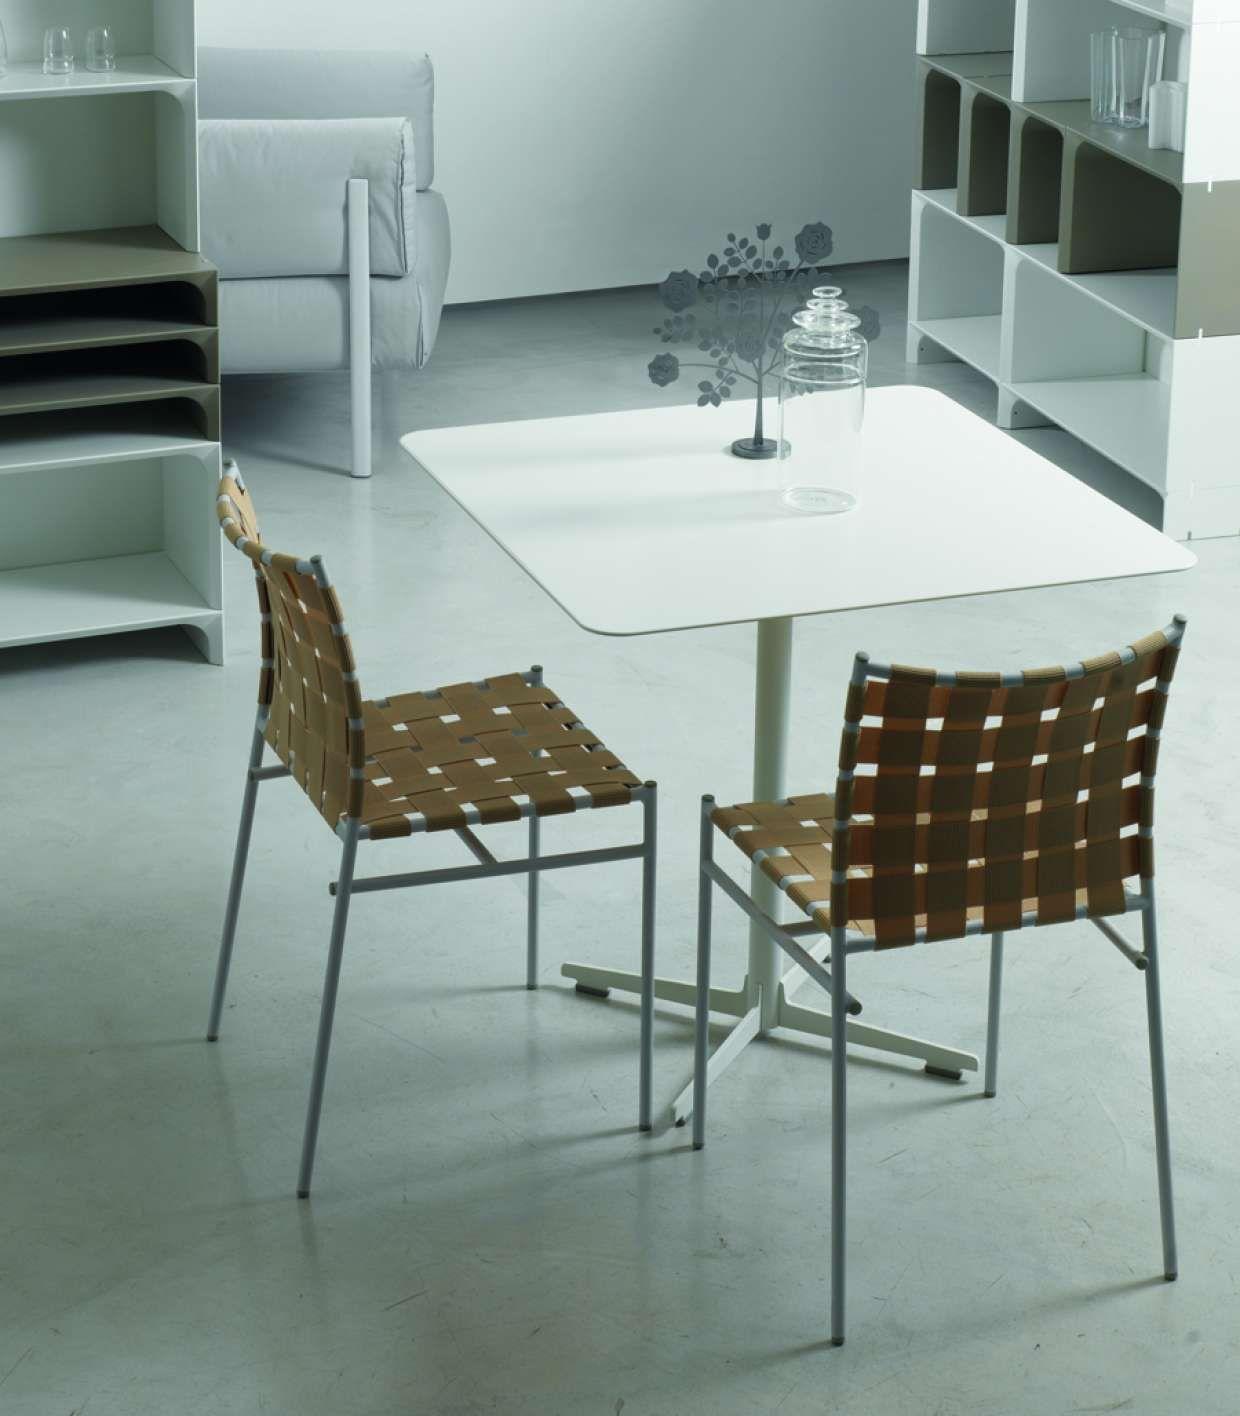 Italian Sofa Brent Cross: Cross Table By Alias Design #interiors #interiordesign